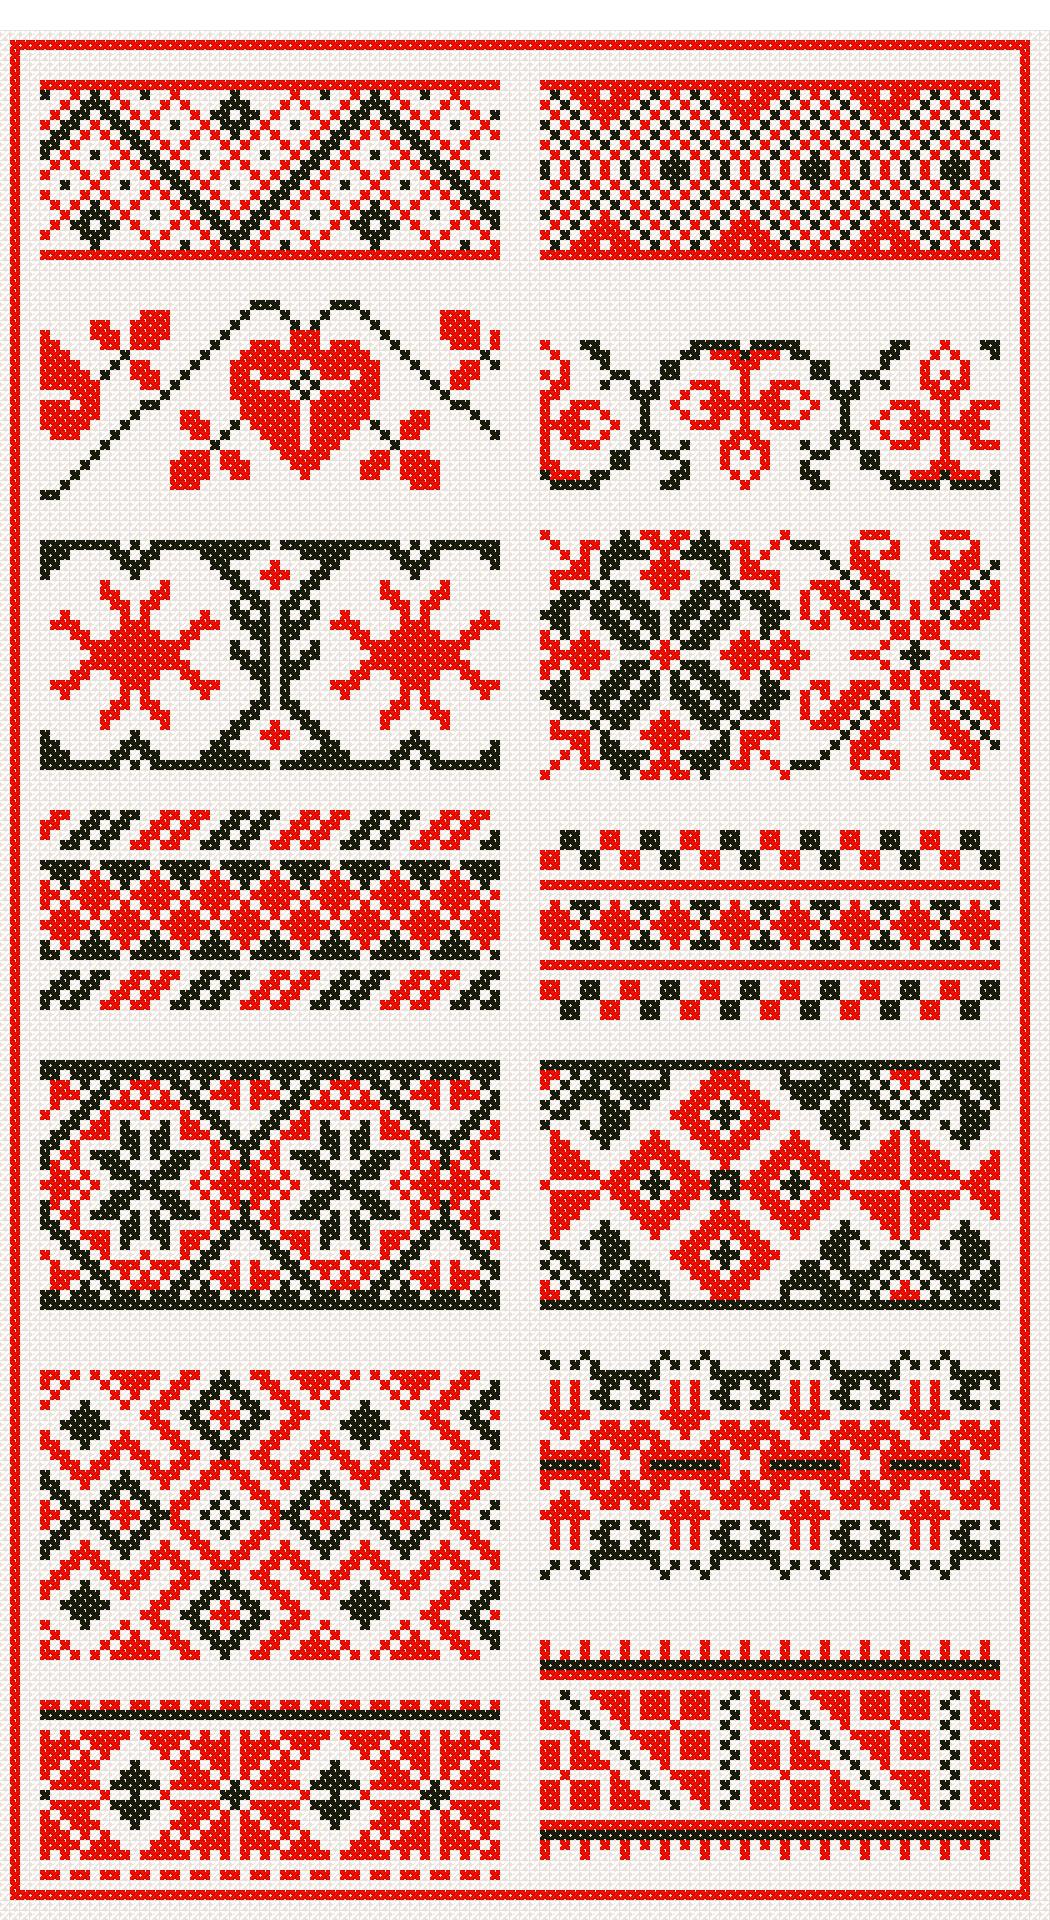 Weelittlestitches a stitching tradition